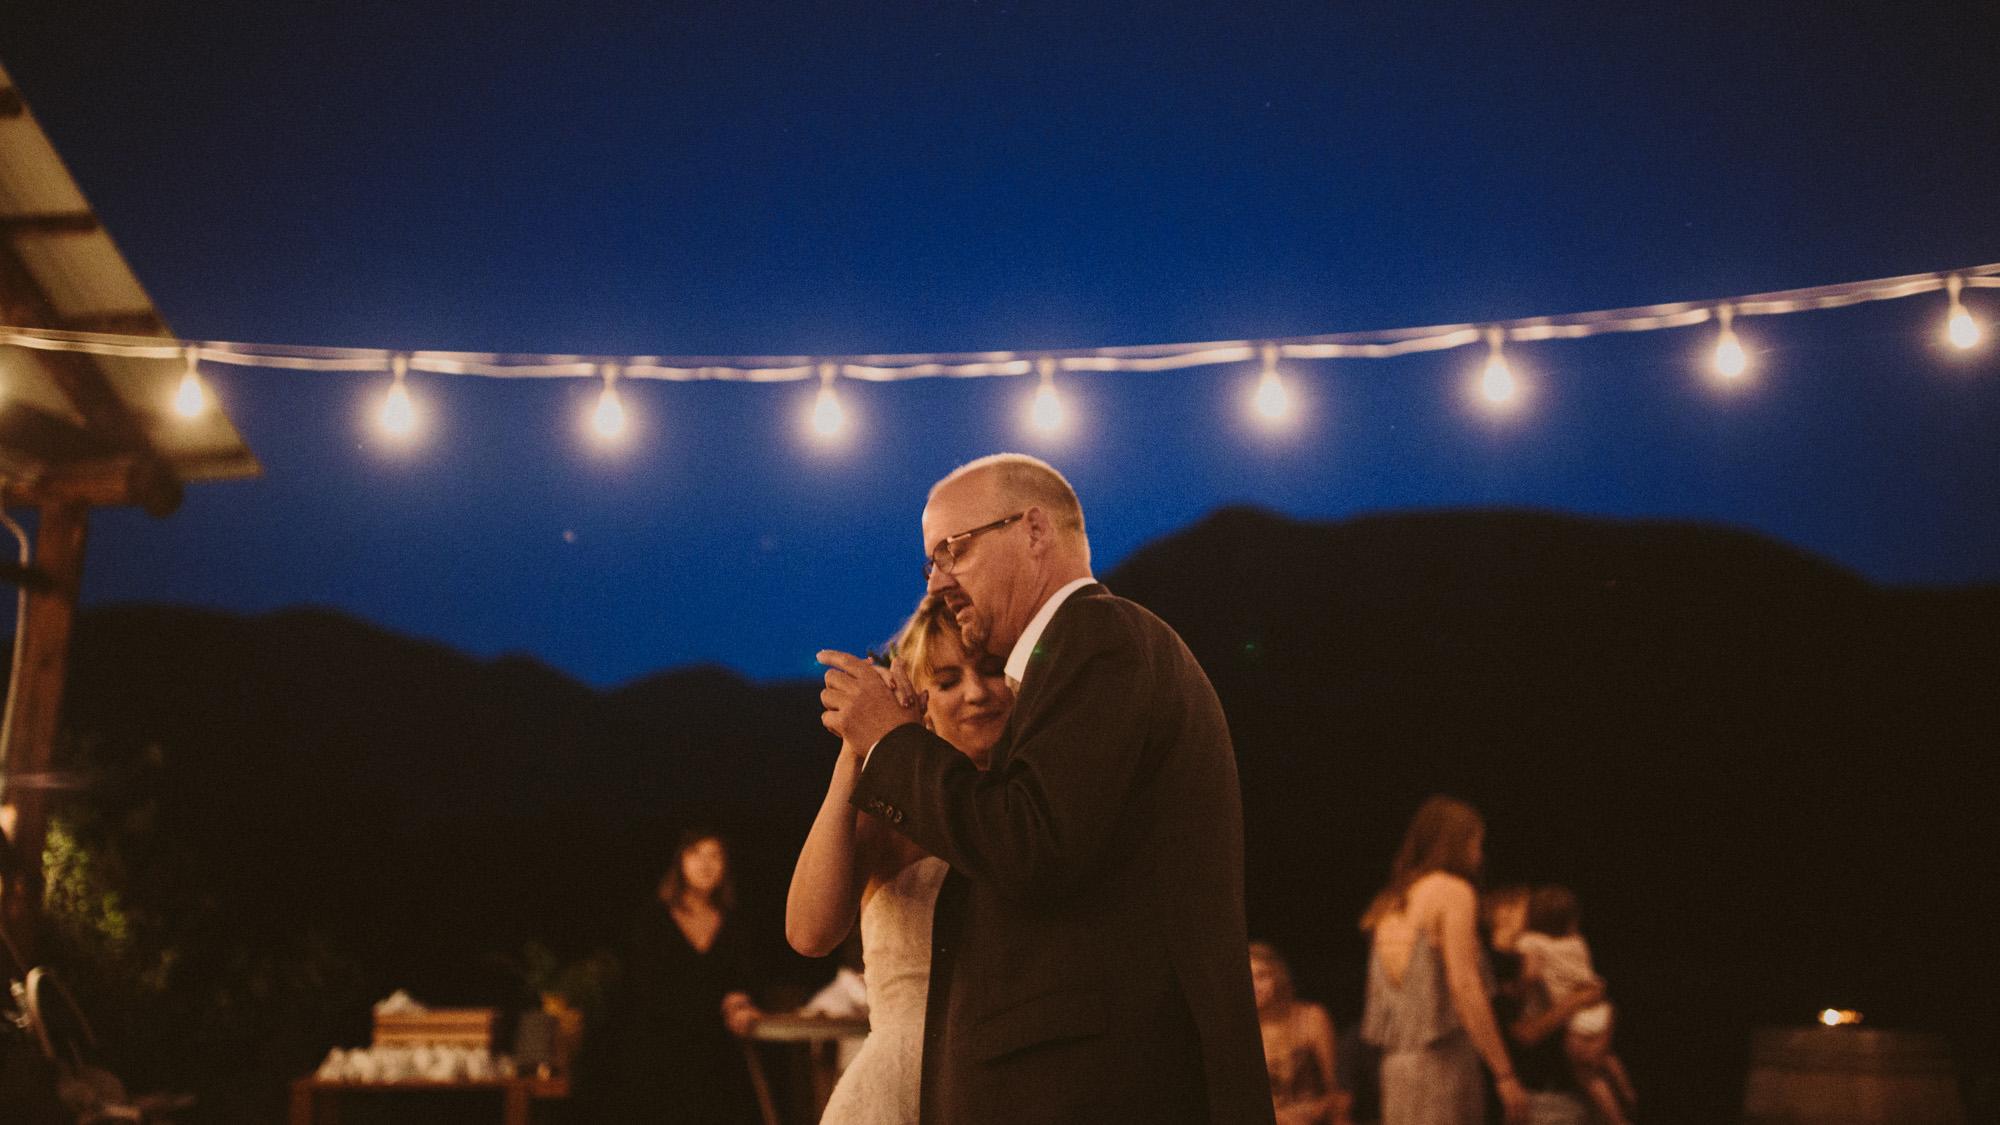 Montana_Wedding_Photos_alec_vanderboom-0145.jpg